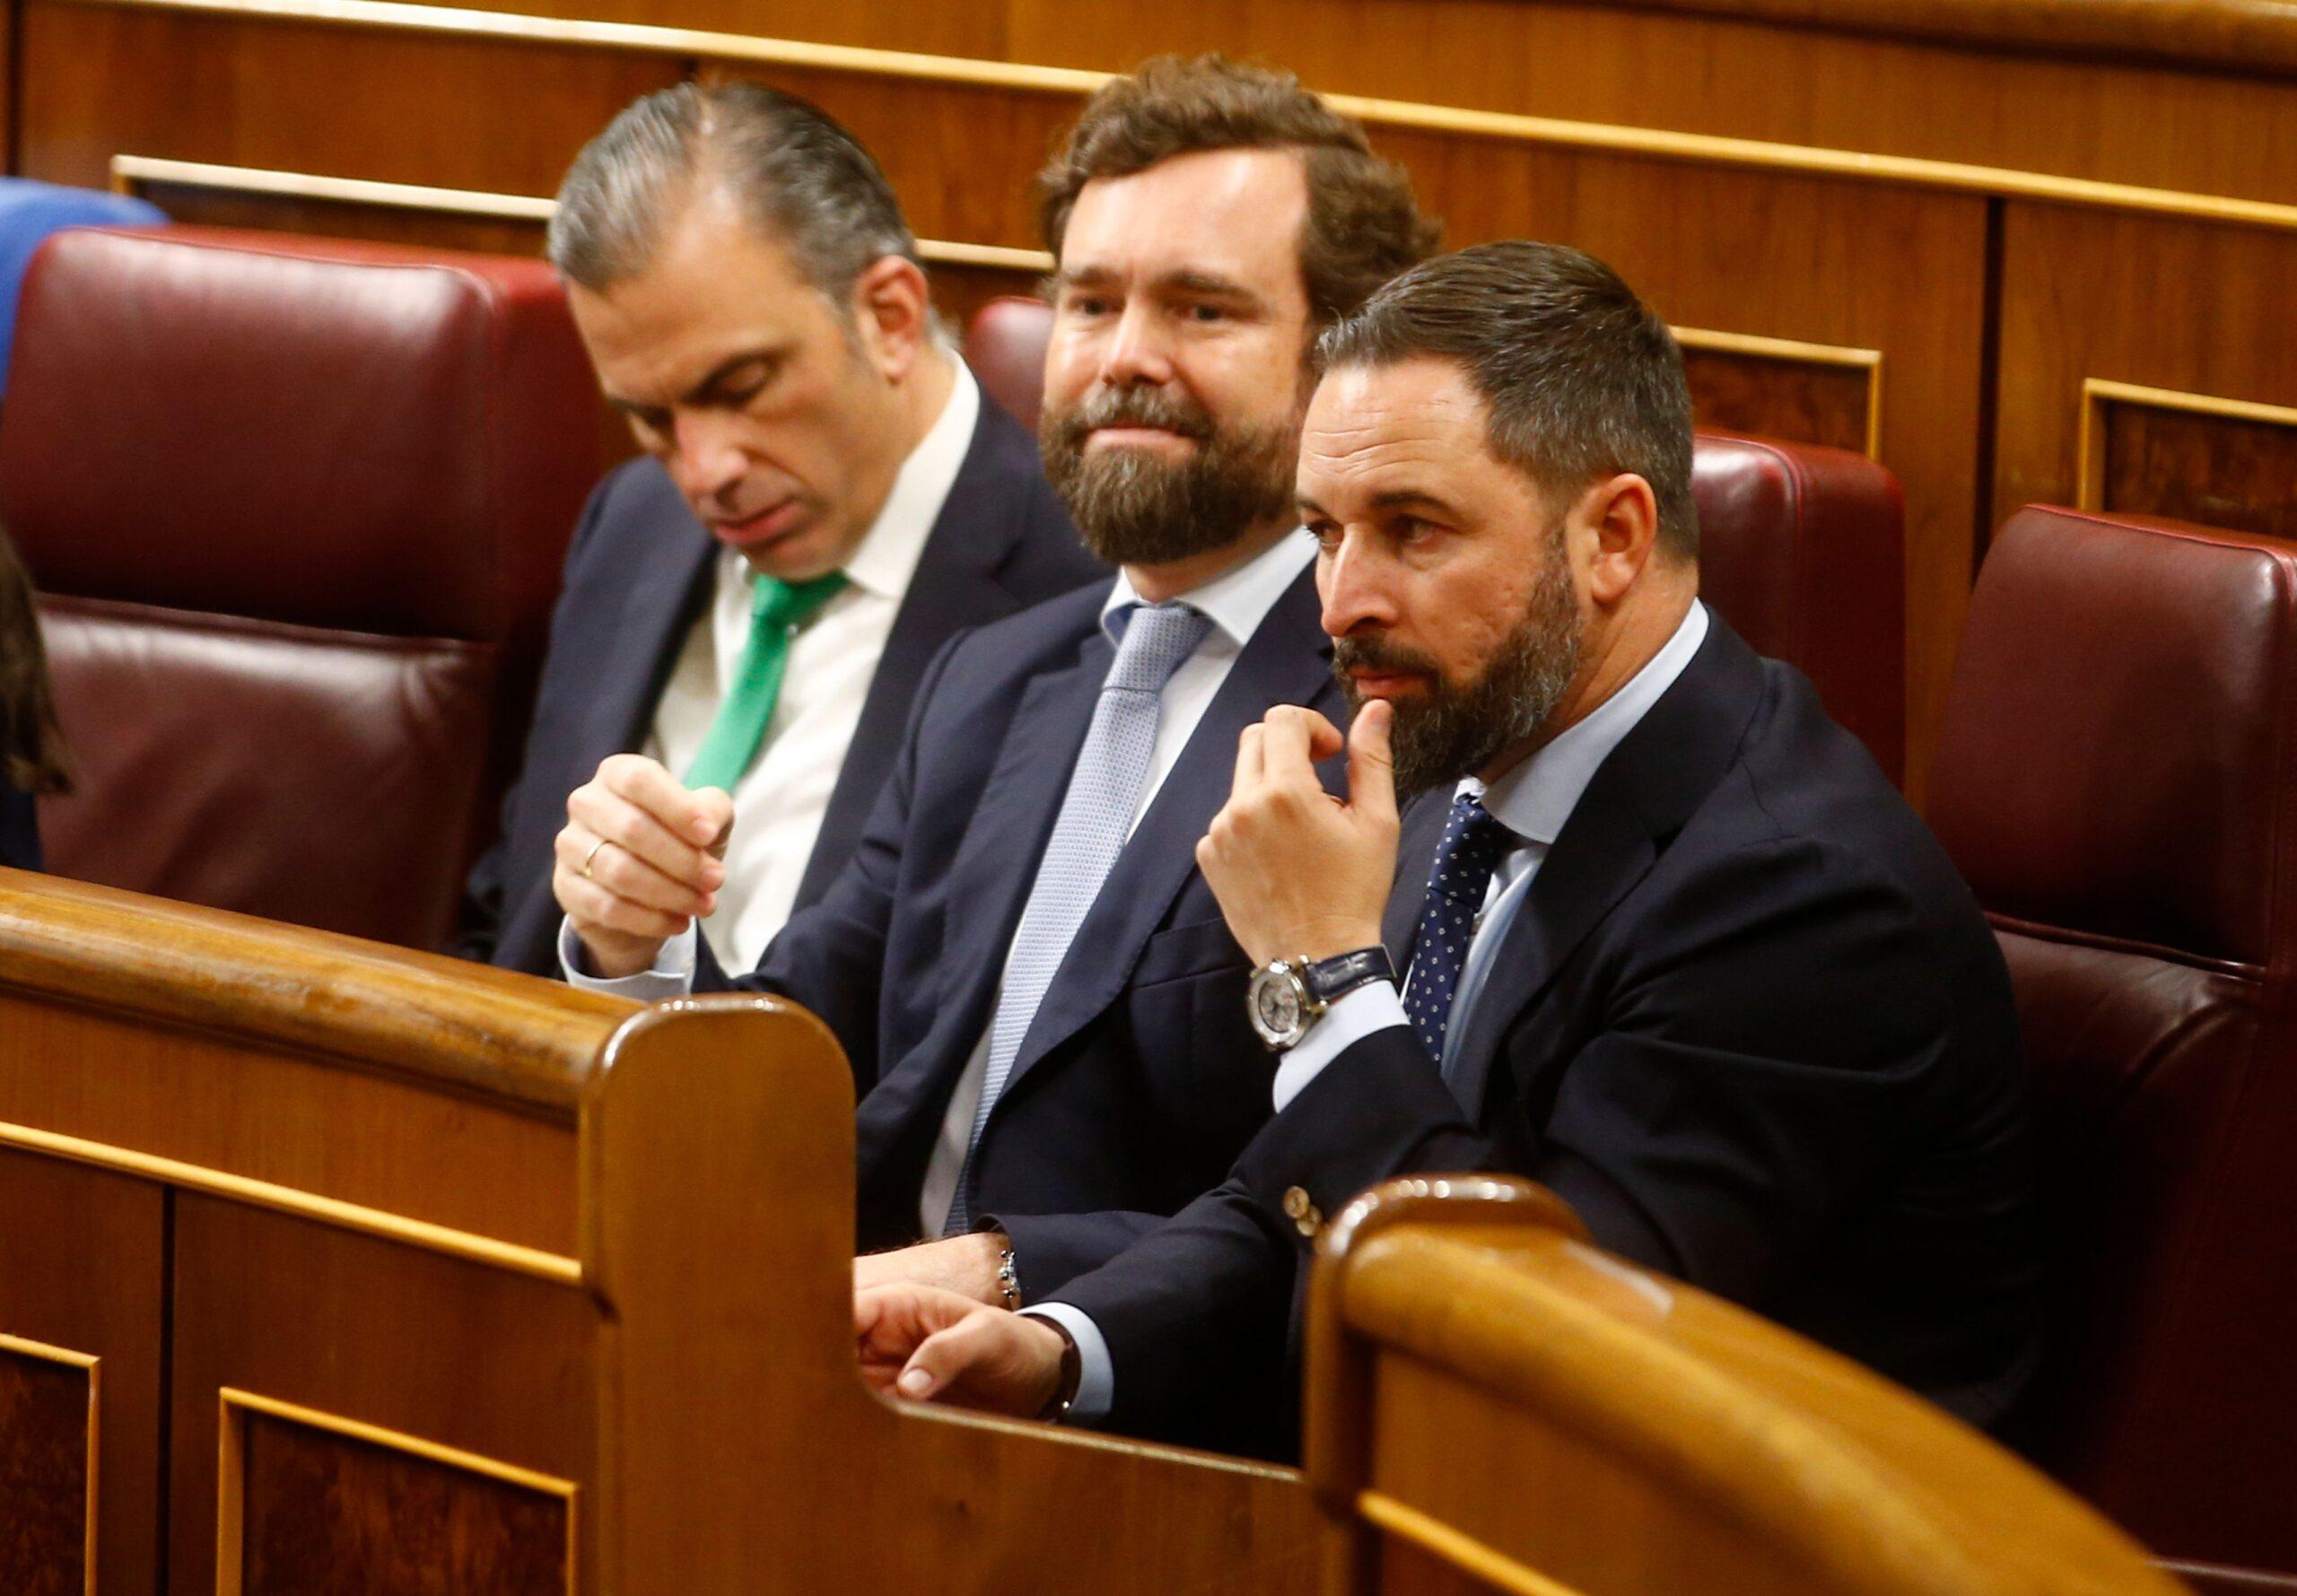 Els diputats de Vox Santiago Abascal, Iván Espinosa de los Monteros i Javier Ortega Smith al Congrés espanyol